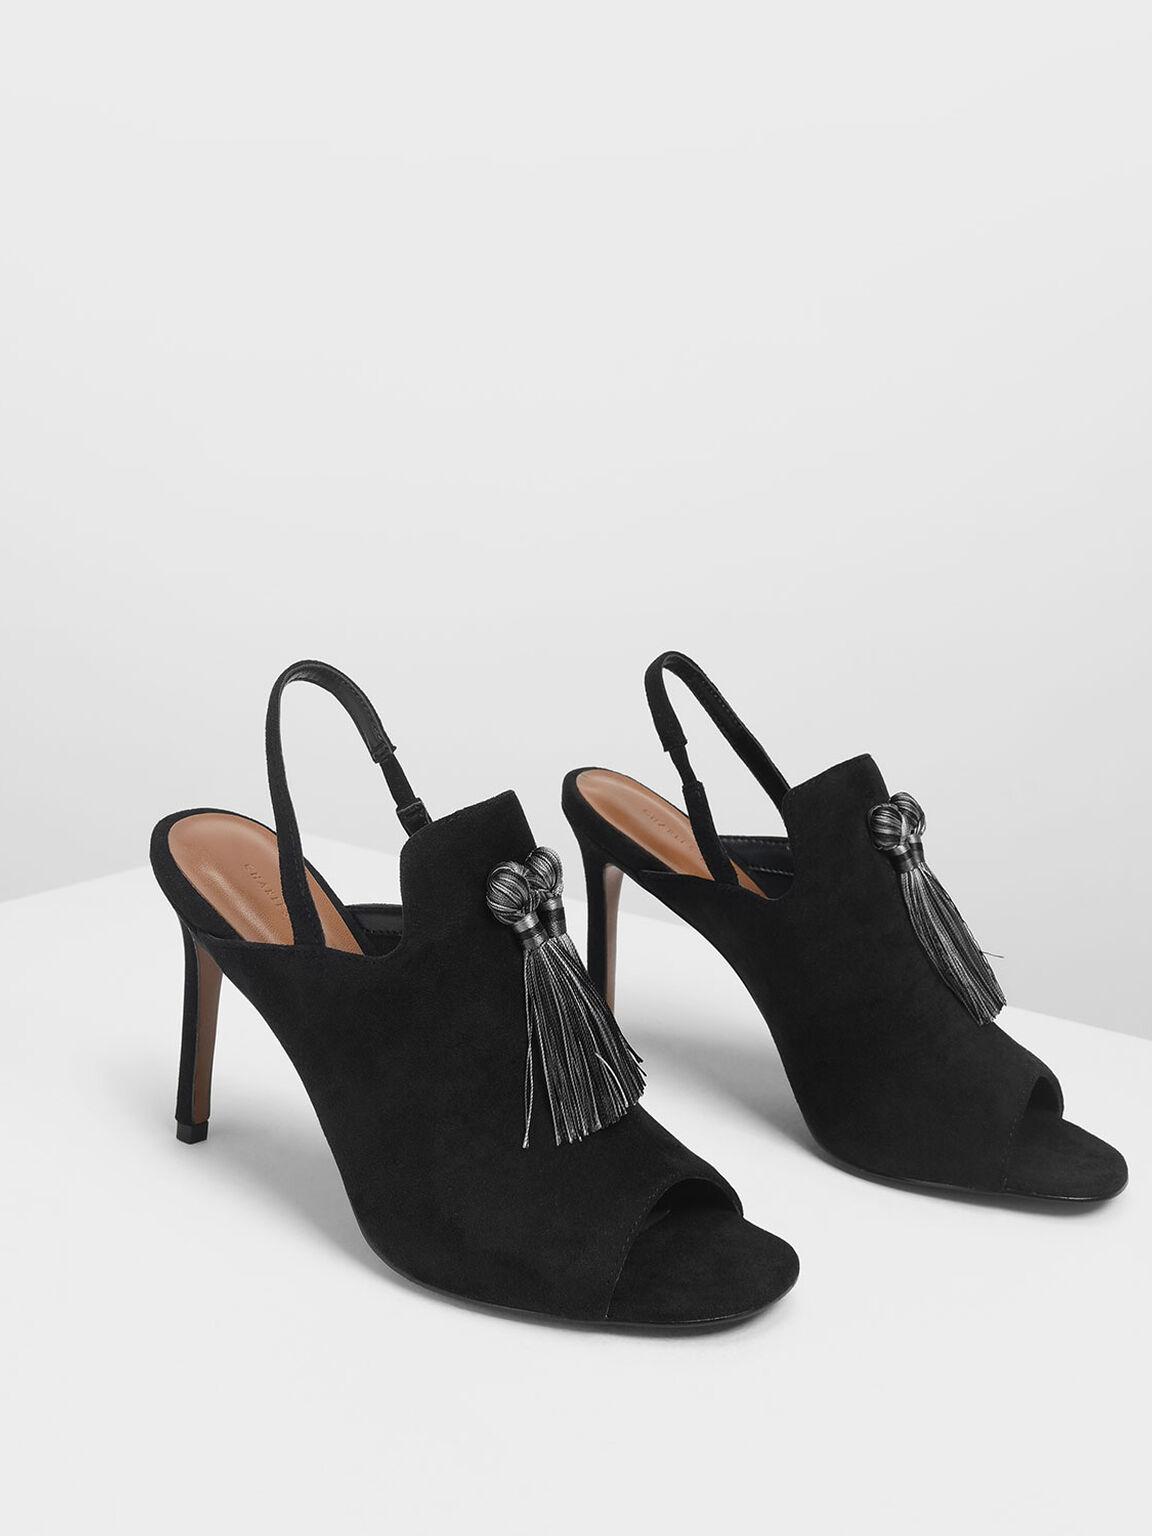 Textured Tassel Slingback Heels, Black, hi-res